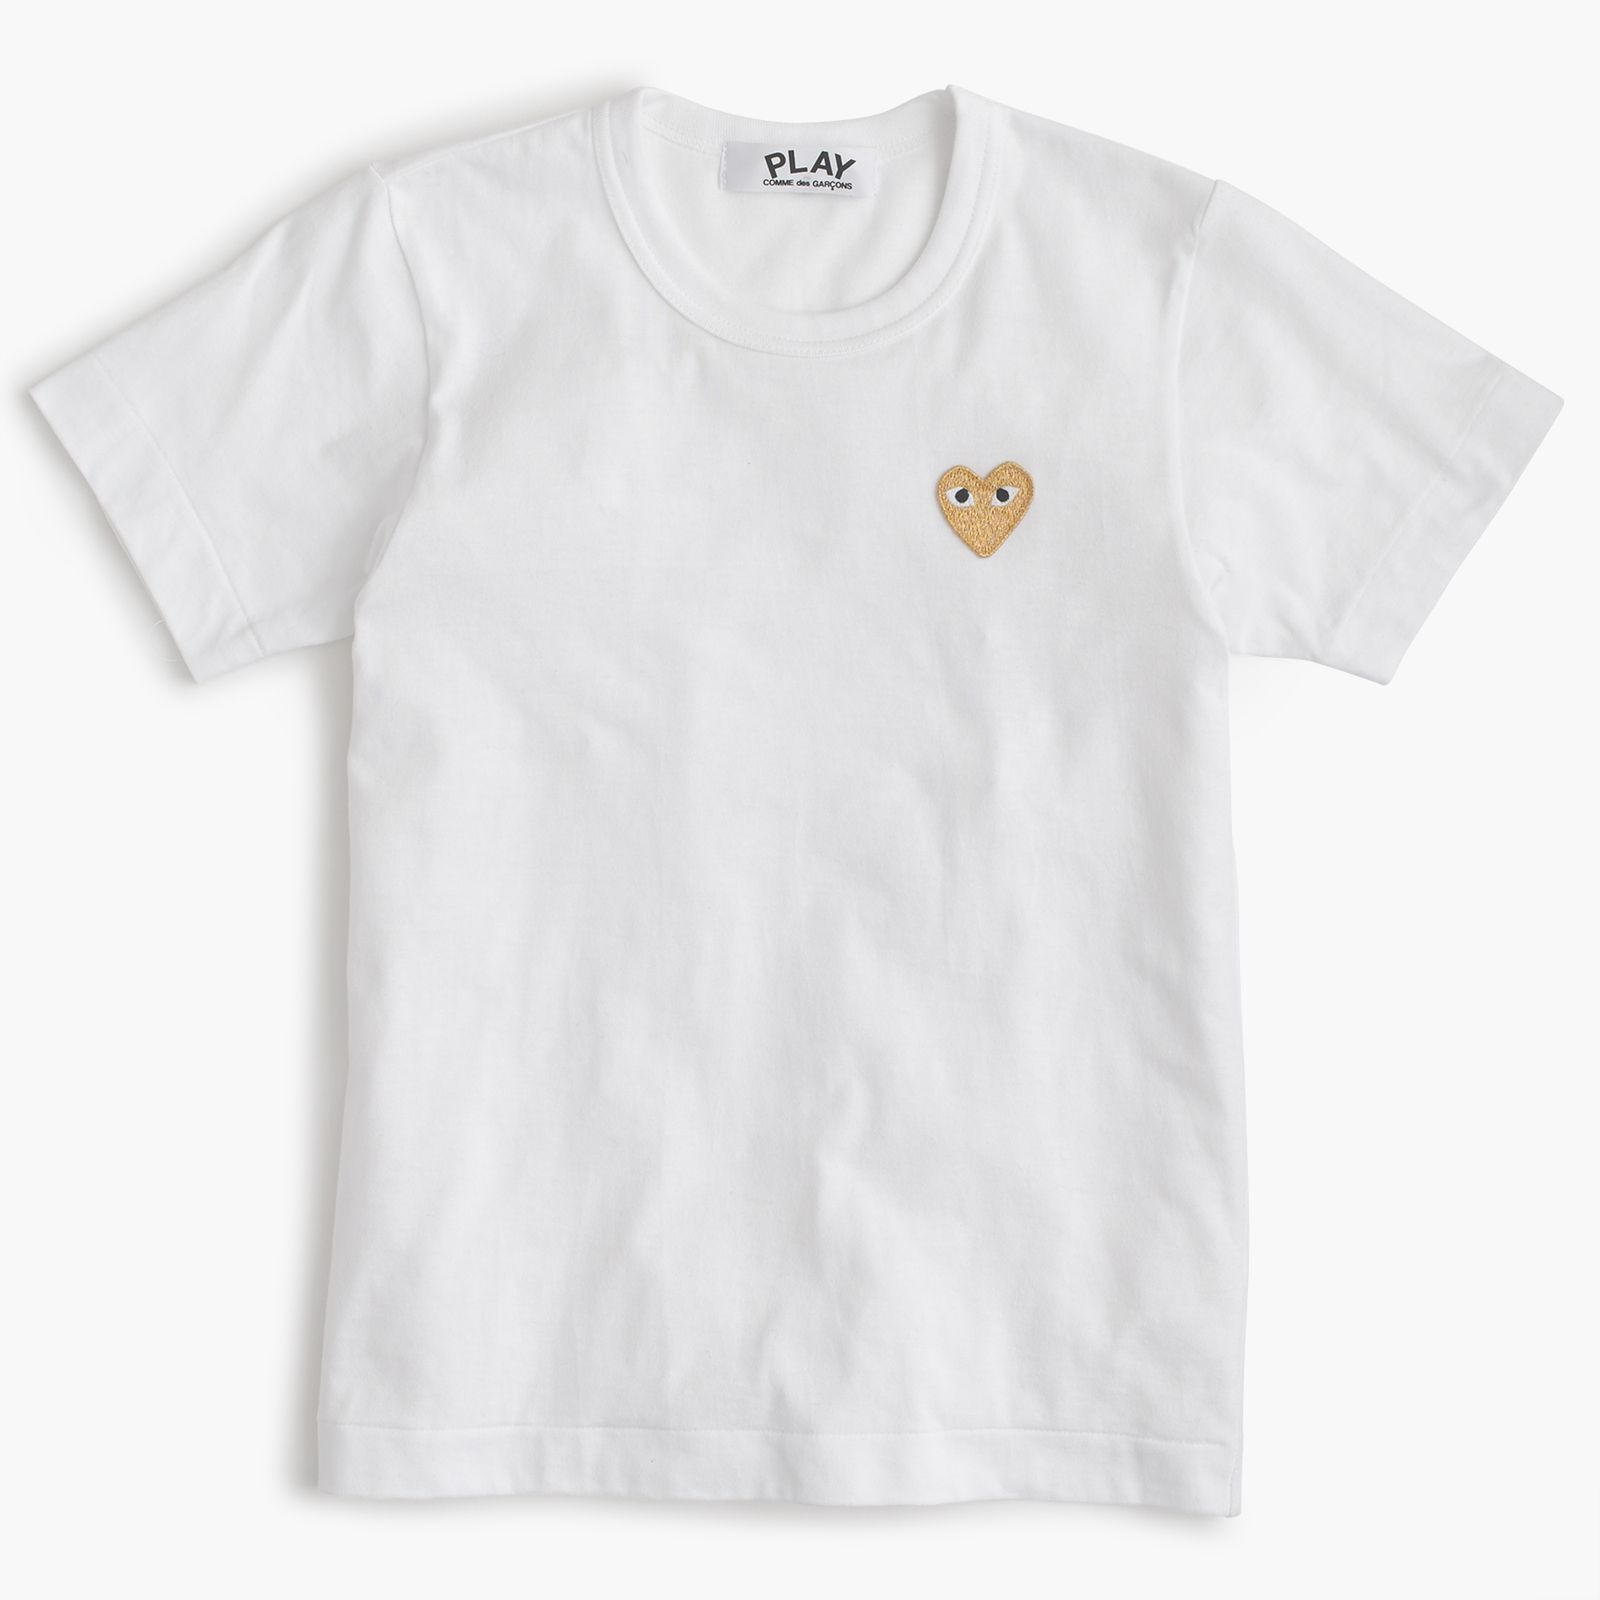 J.Crew Valentine's Day Shop: women's PLAY Comme des Garçons® gold heart T-shirt.